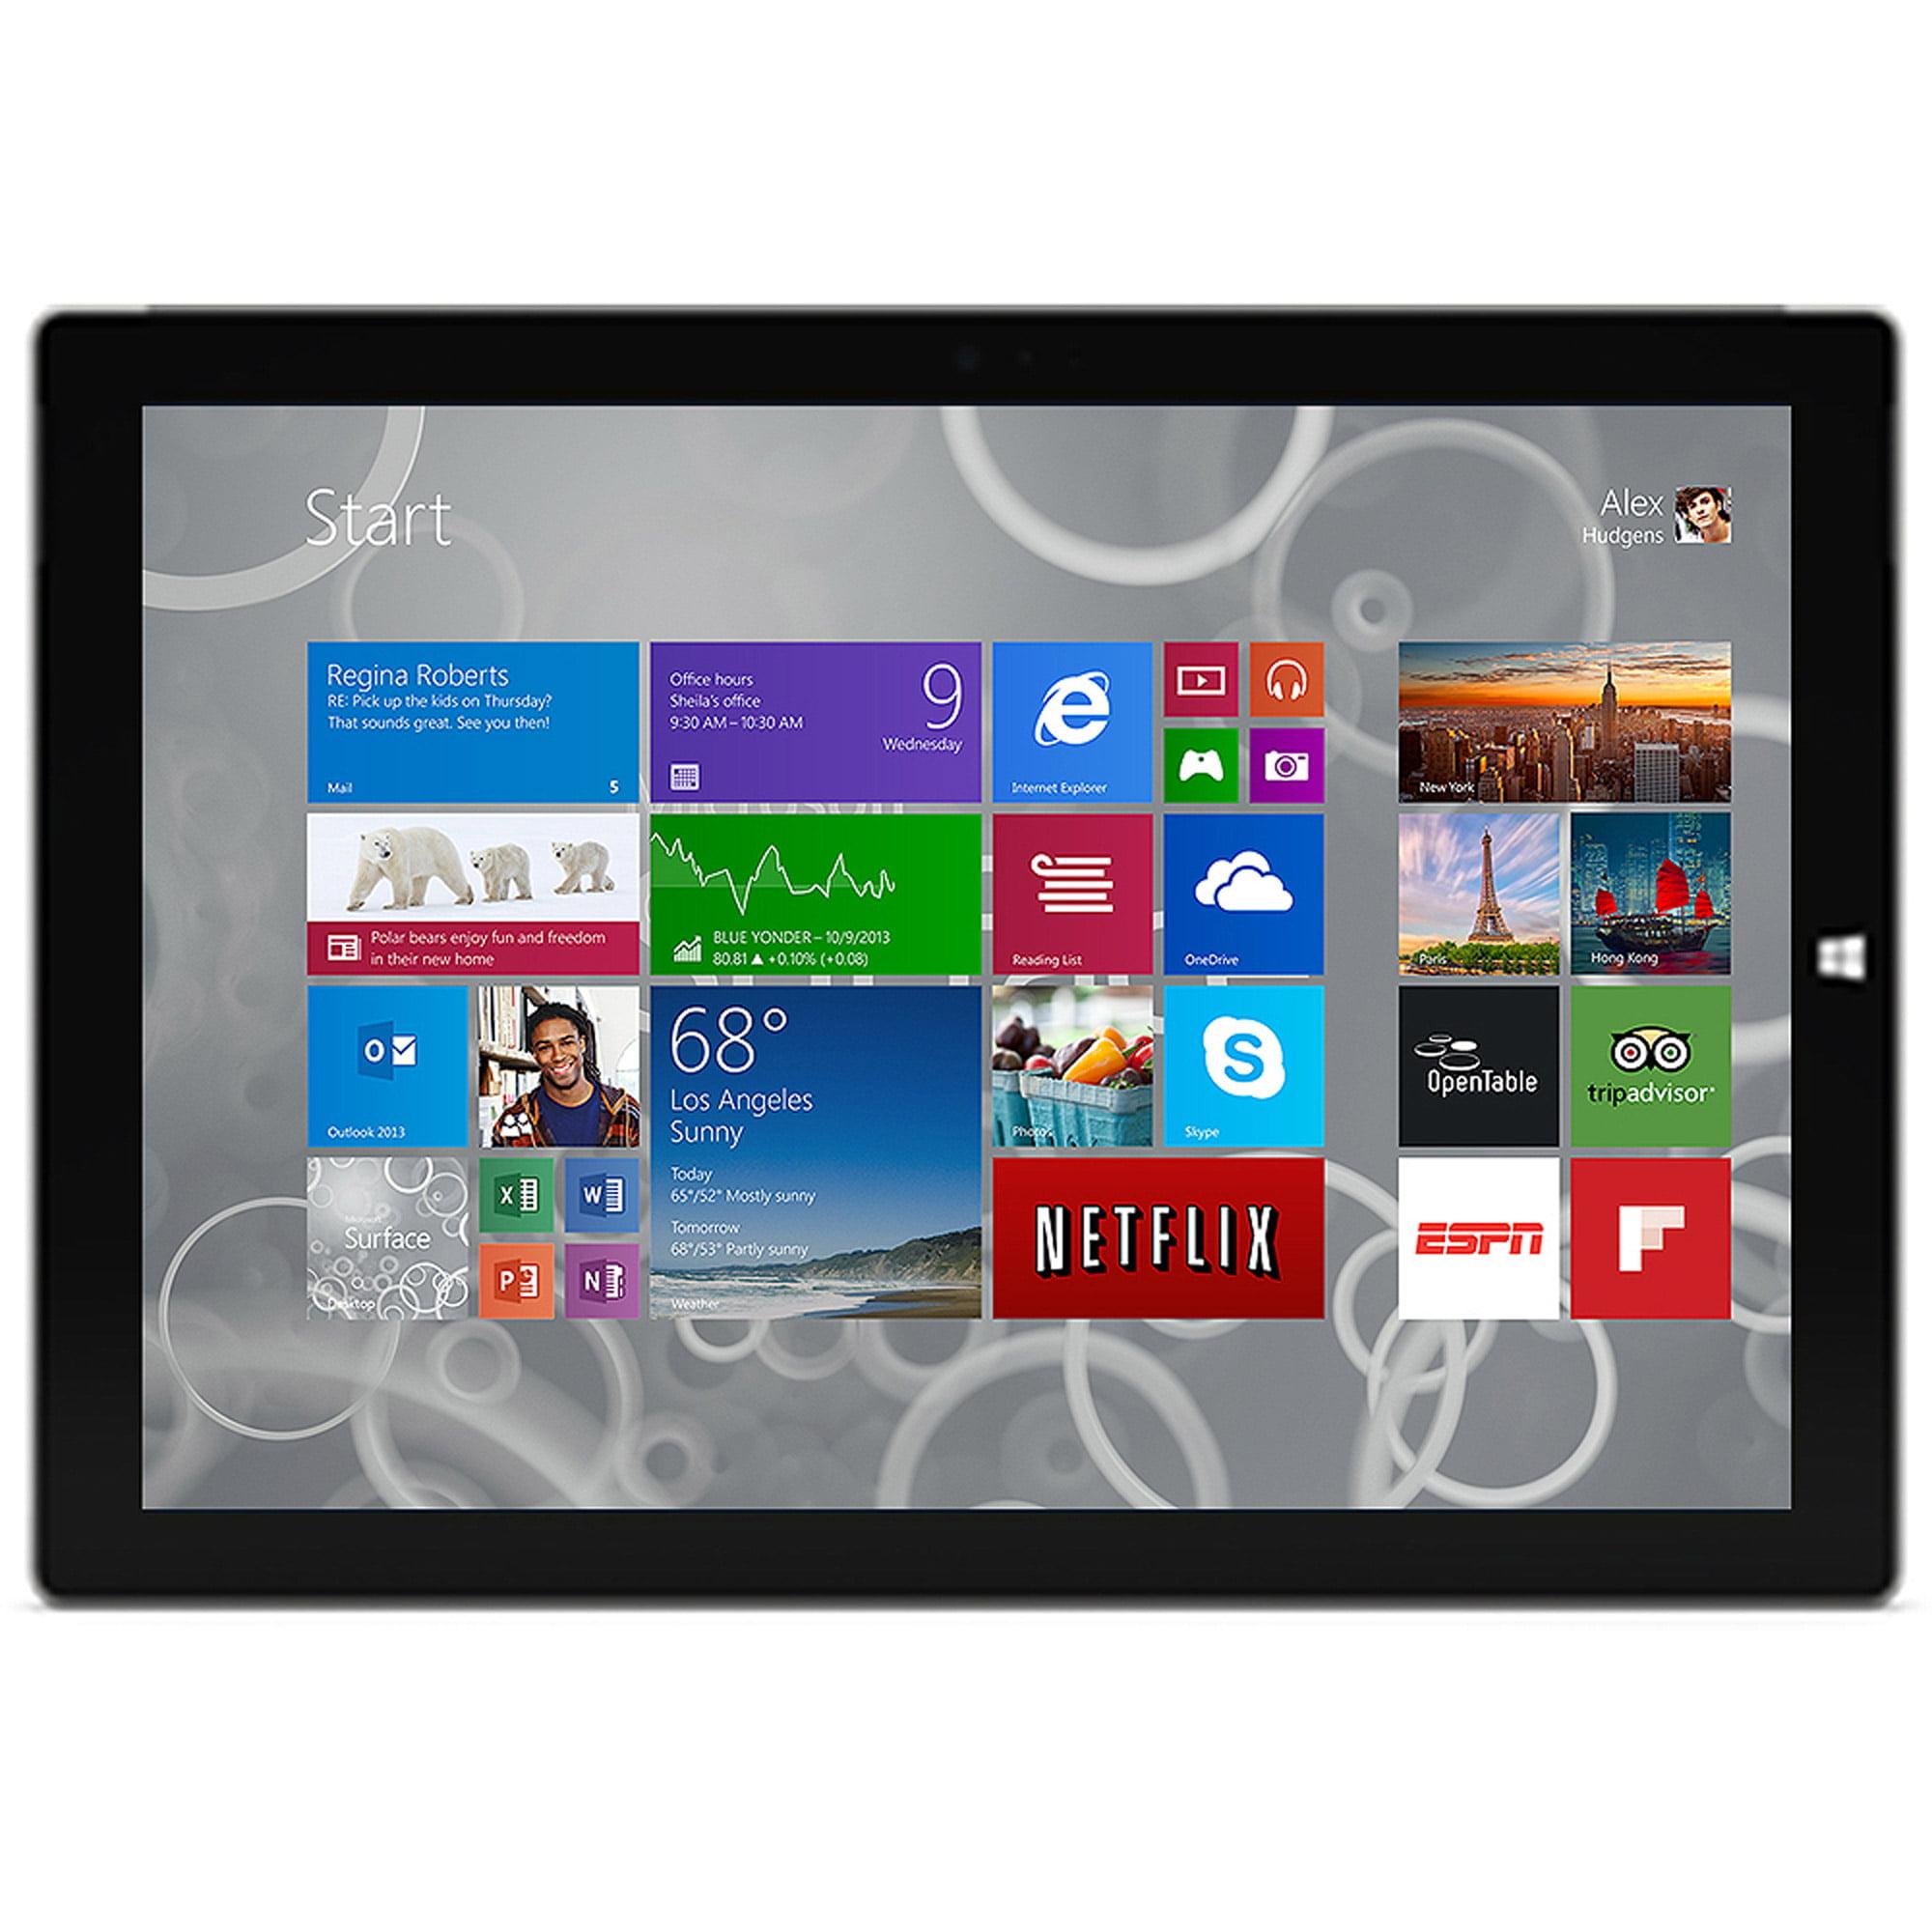 Microsoft Surface Pro 3 512GB Windows 8.1 Pro (Eligible for Free Windows 10 Upgrade) Intel Core i7